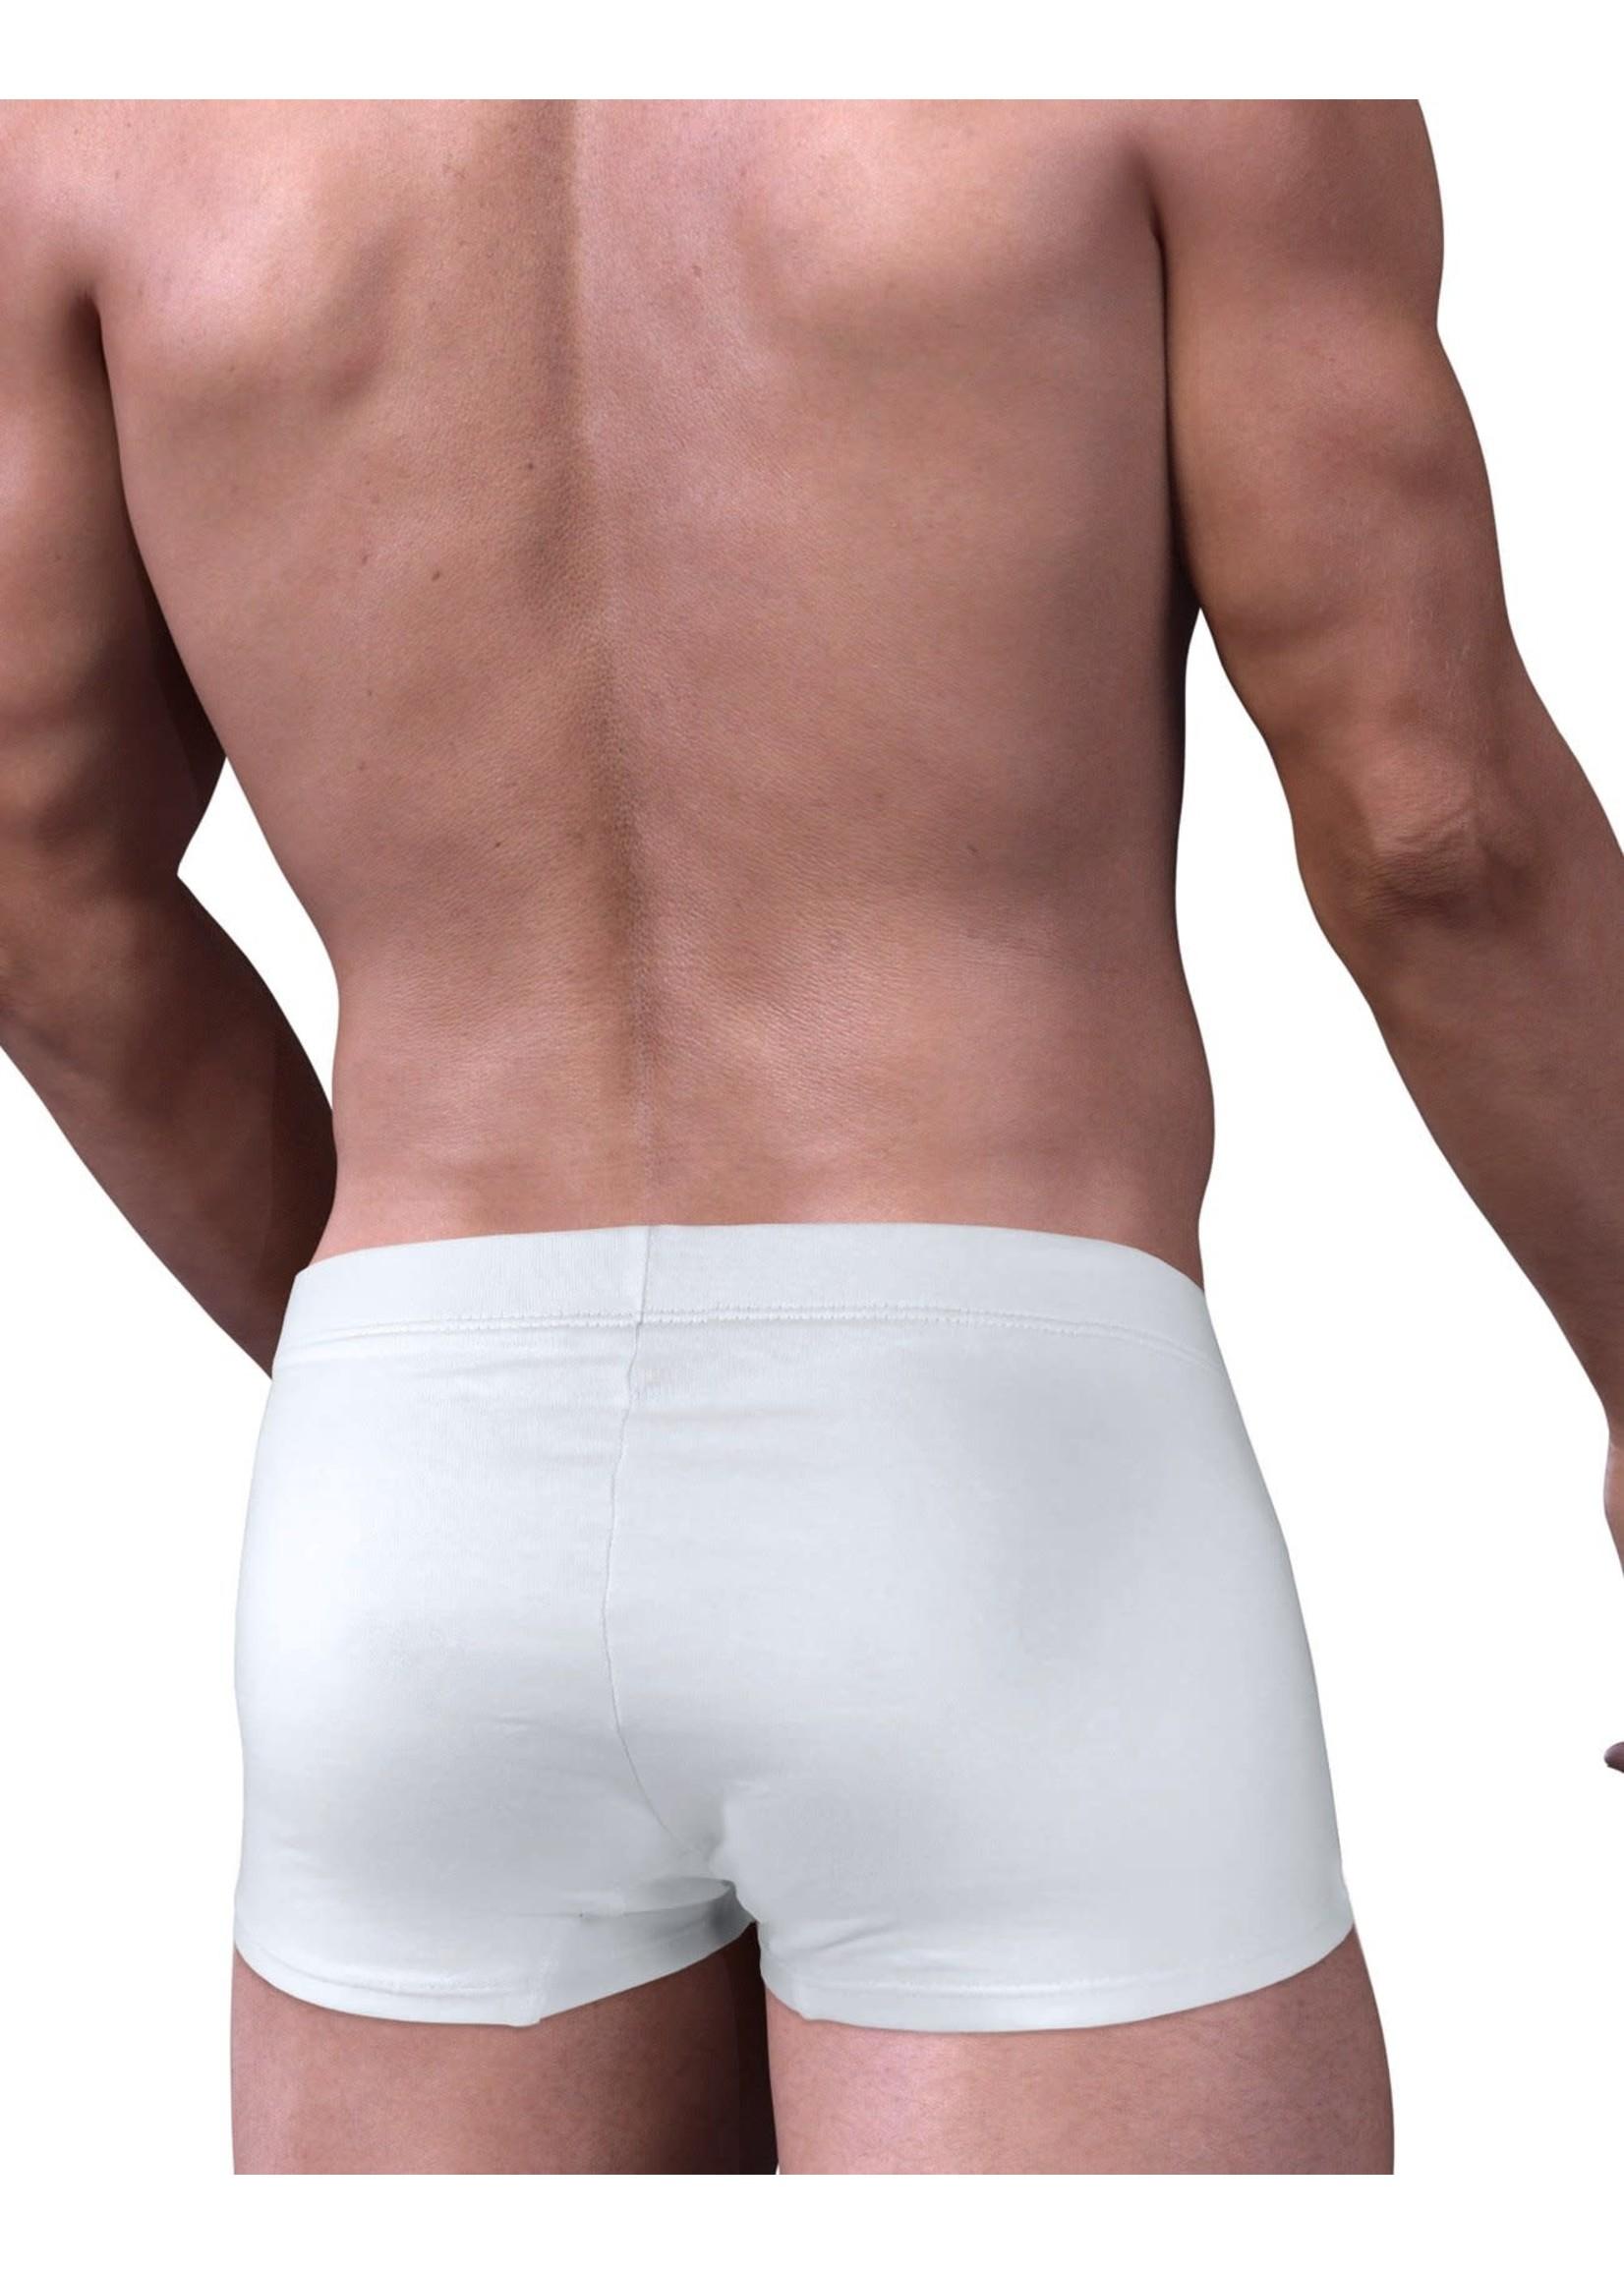 WildmanT WildmanT Stretch Cotton Boxer